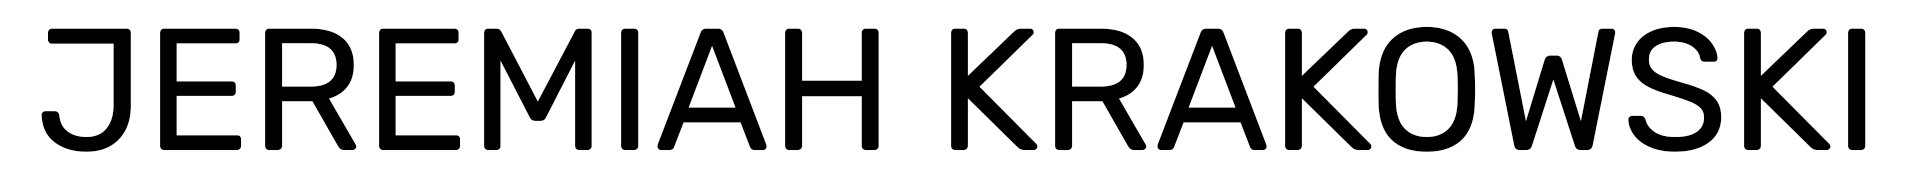 Jeremiah Krakowski Members Area